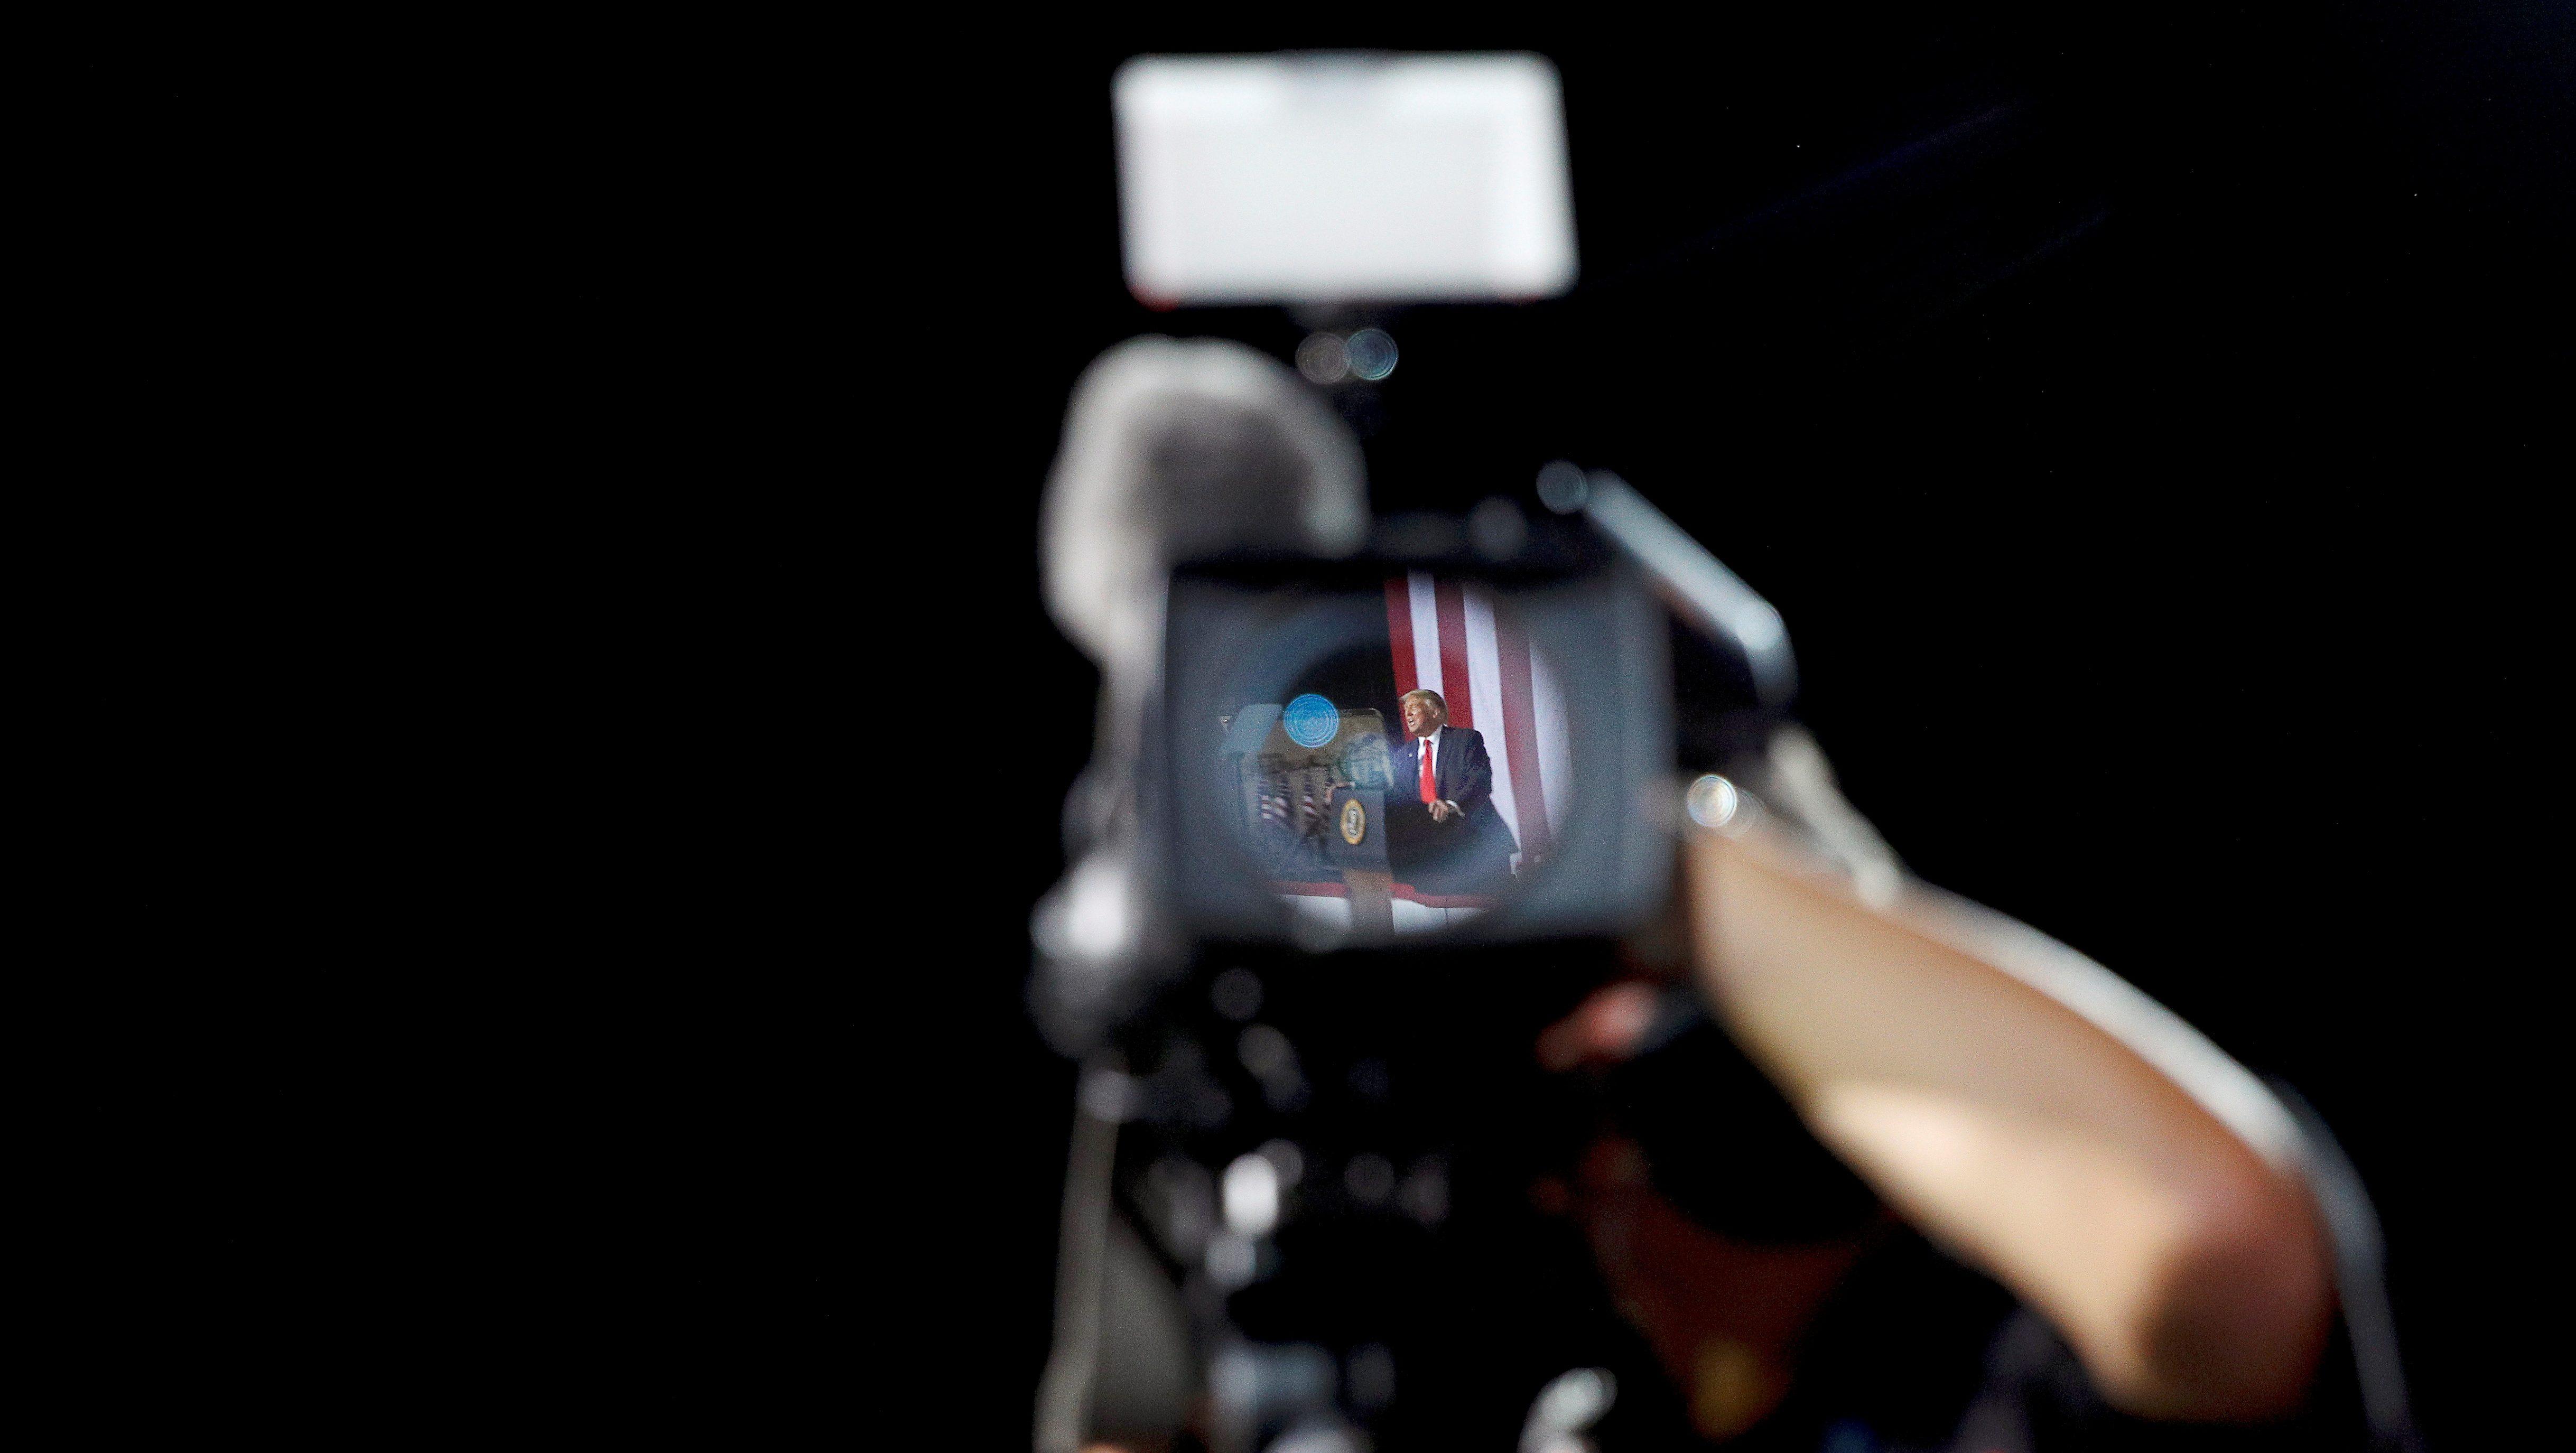 A video camera captures an image of Donald Trump at a rally in North Carolina.